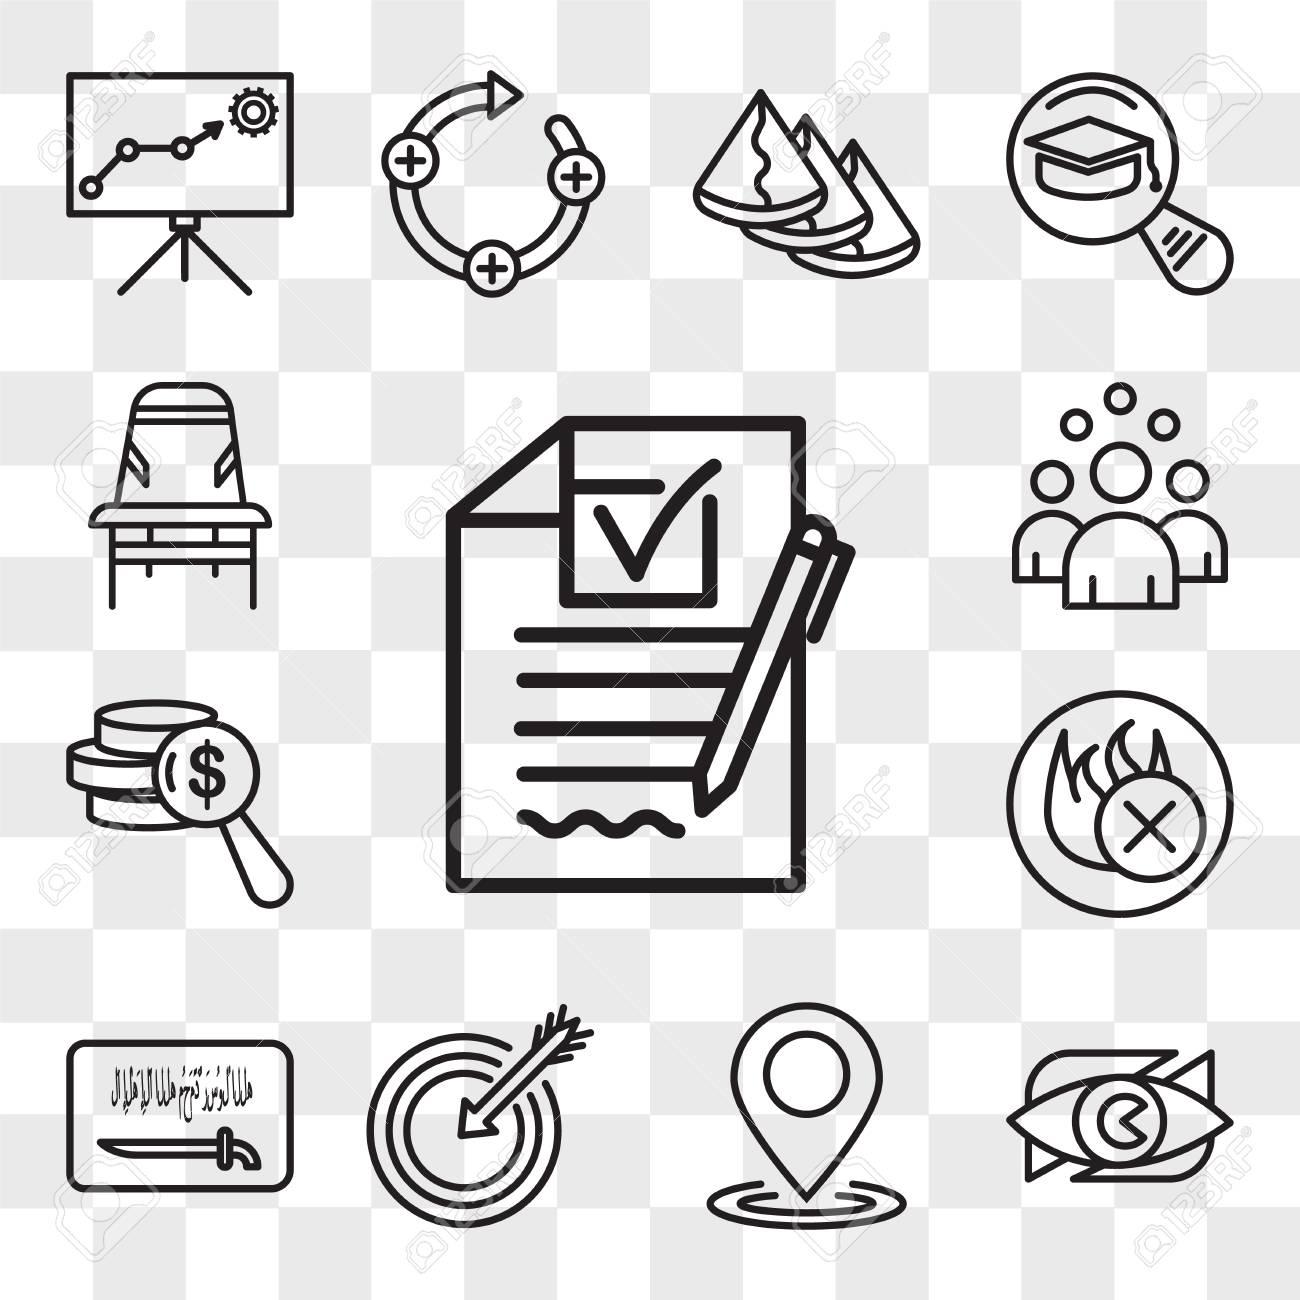 Set Of 13 transparent editable icons such as rfp, neighborhood